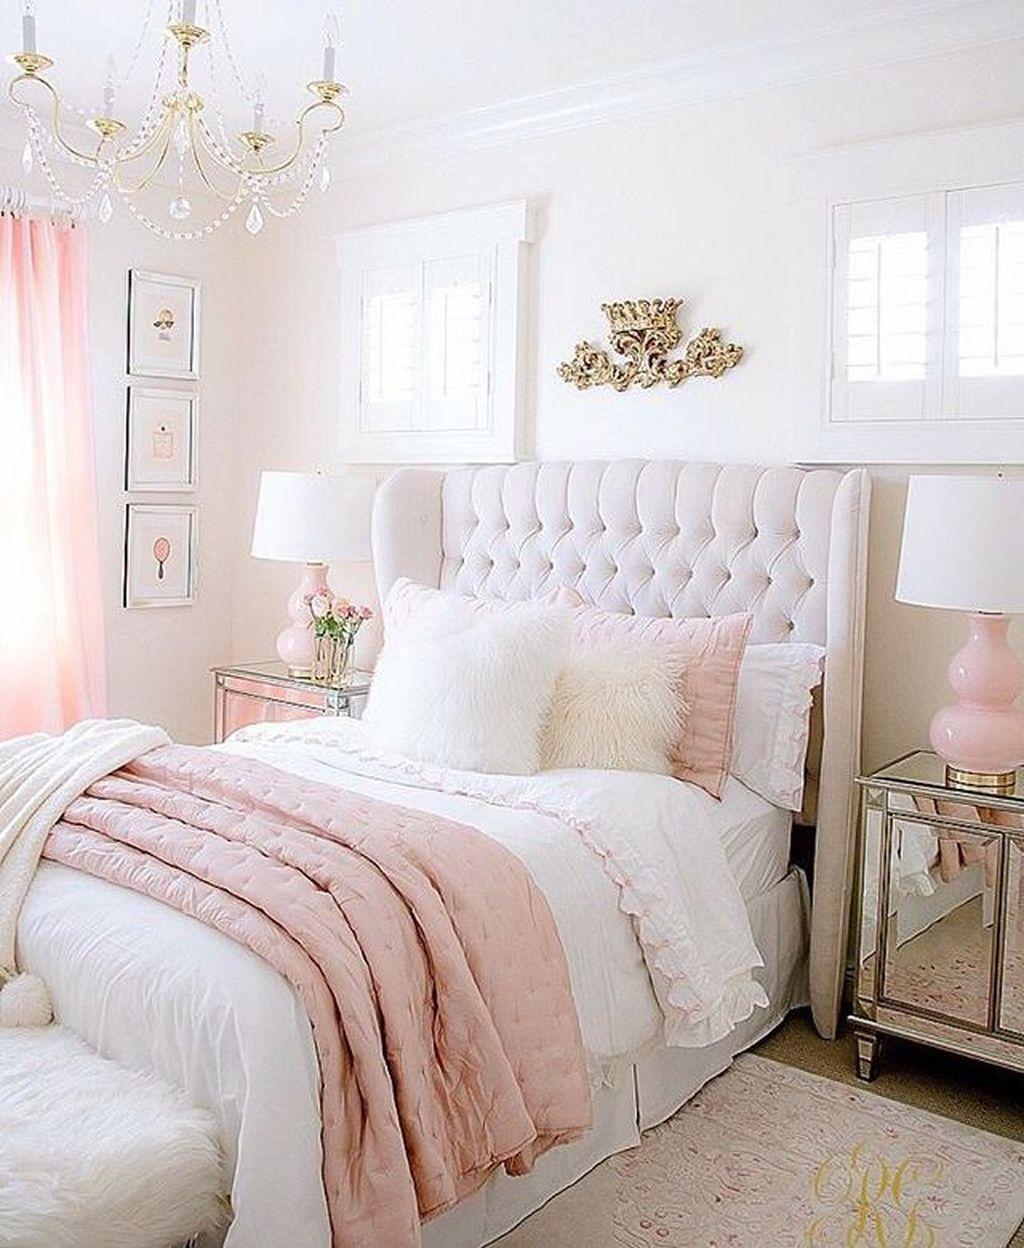 47 Charming Pink Bedroom Design Ideas